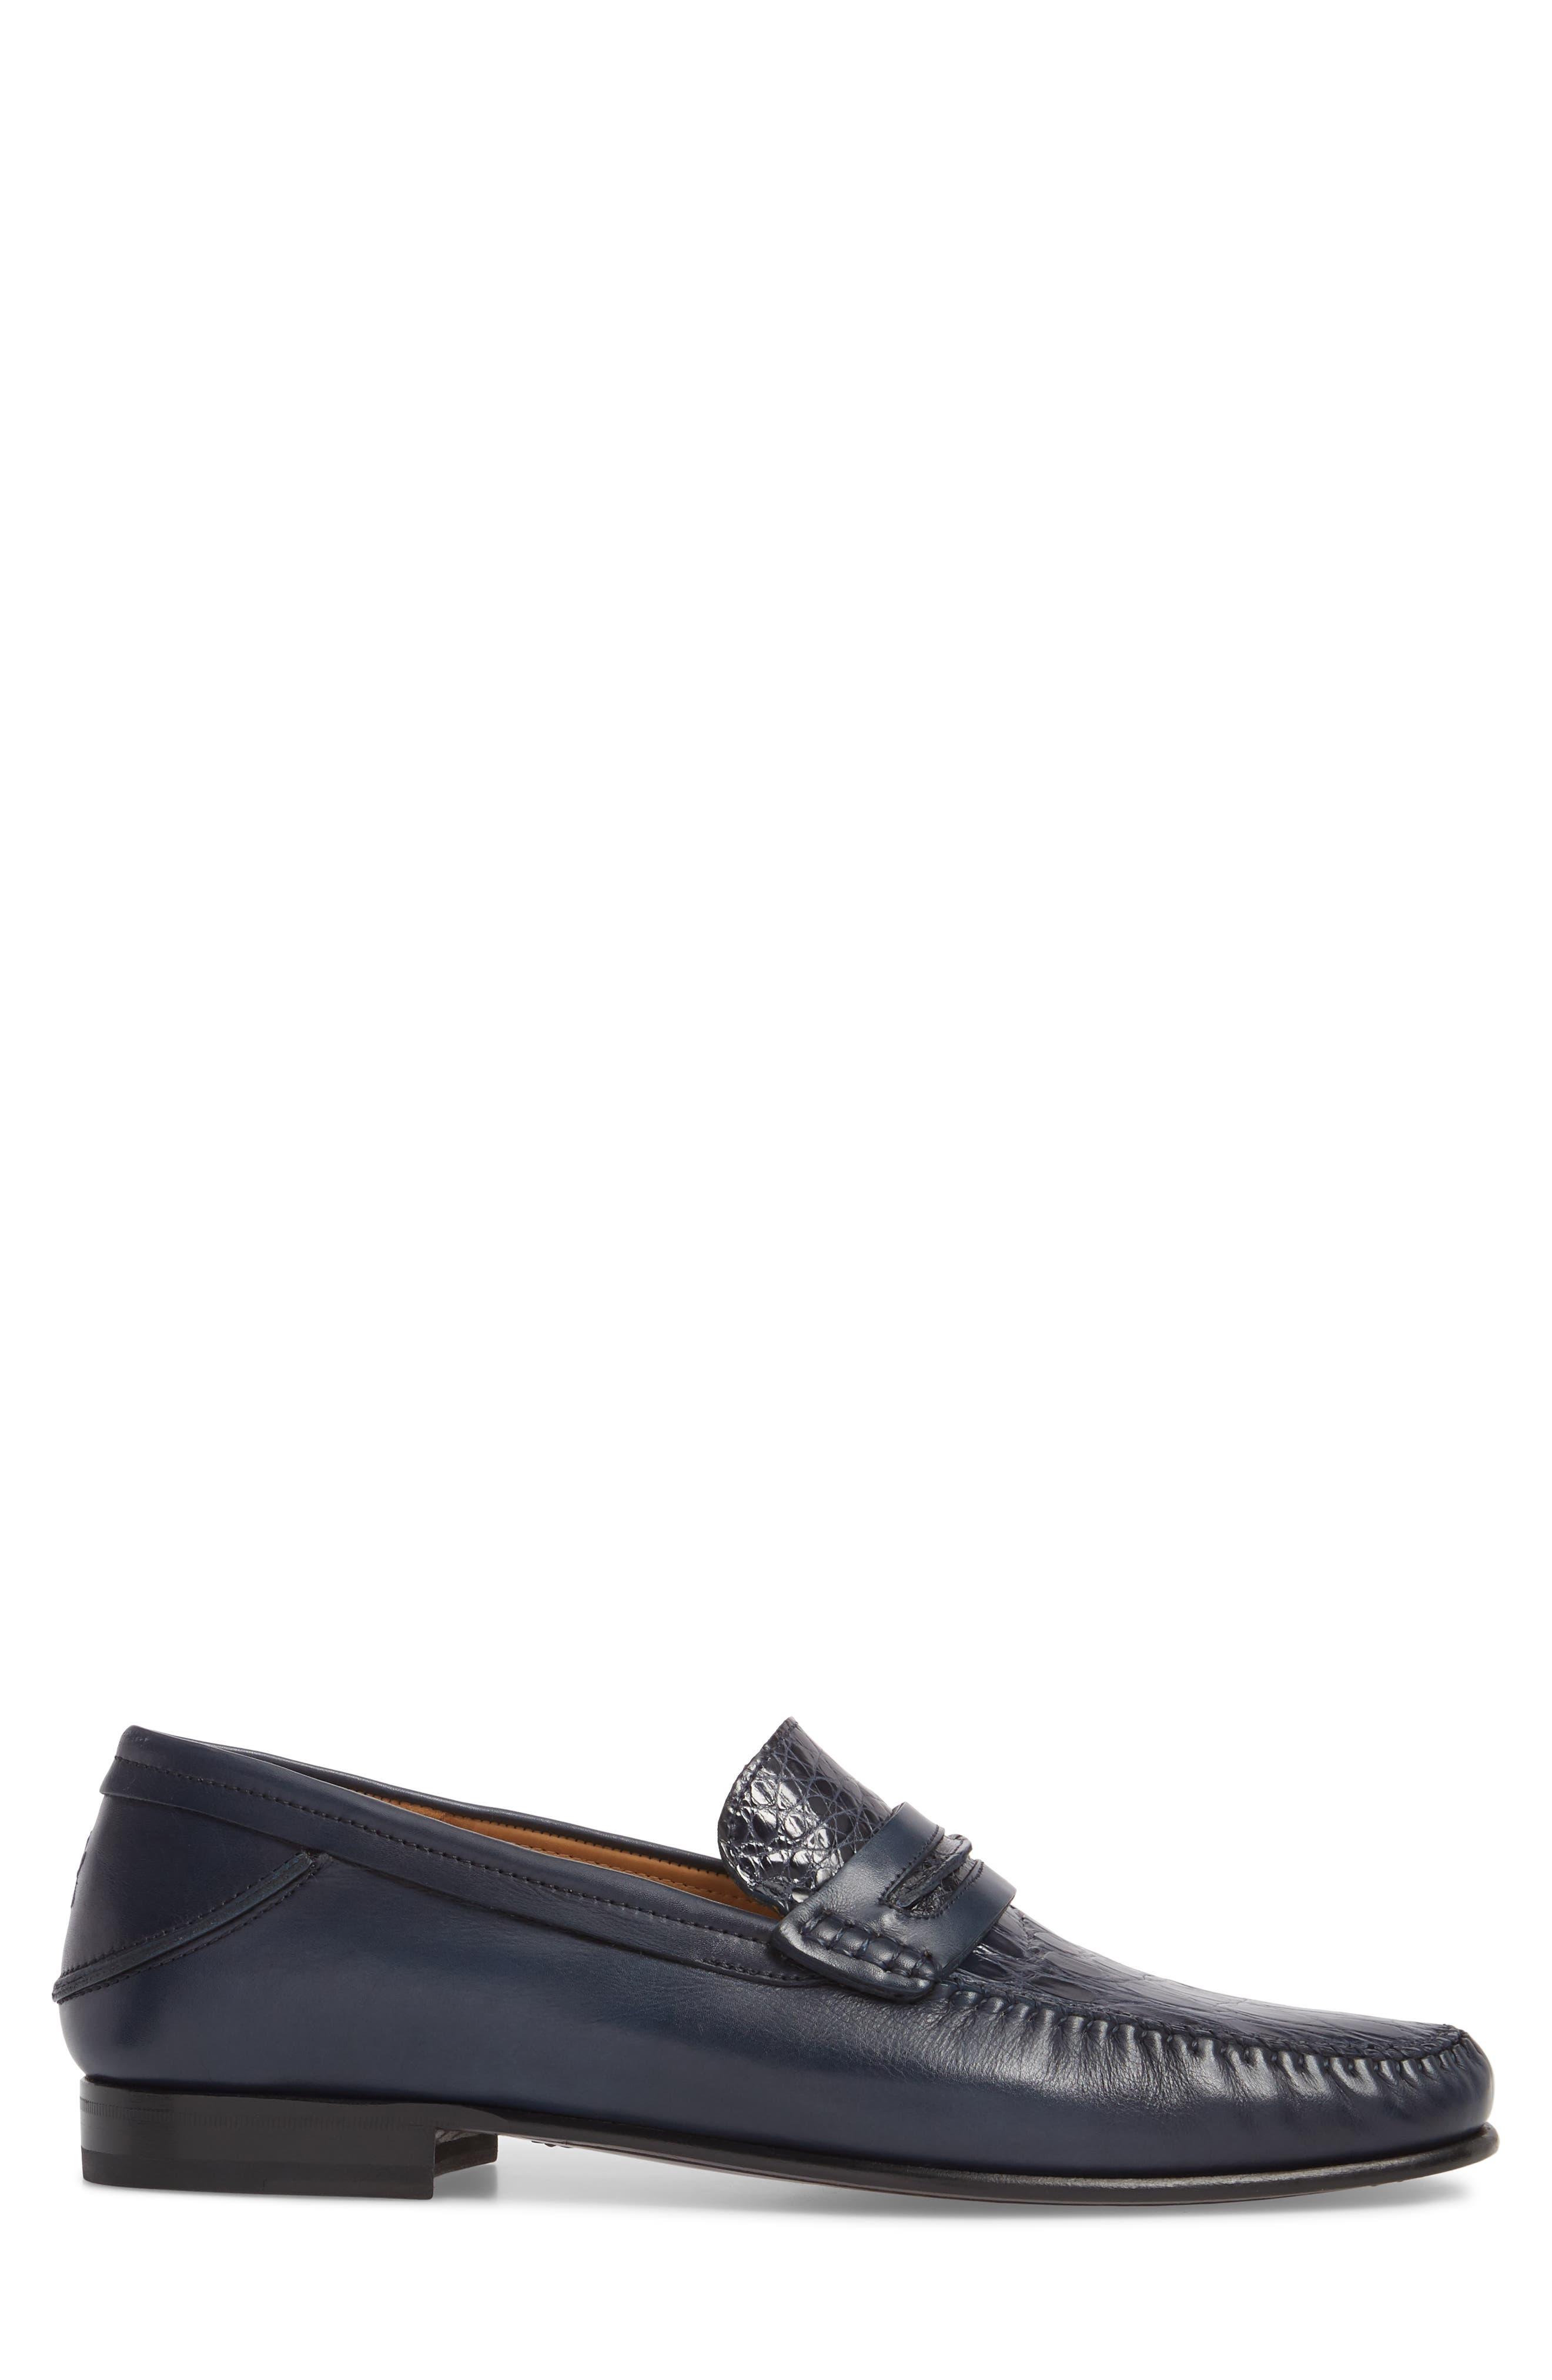 Kronos Moc Toe Penny Loafer,                             Alternate thumbnail 3, color,                             Blue Leather